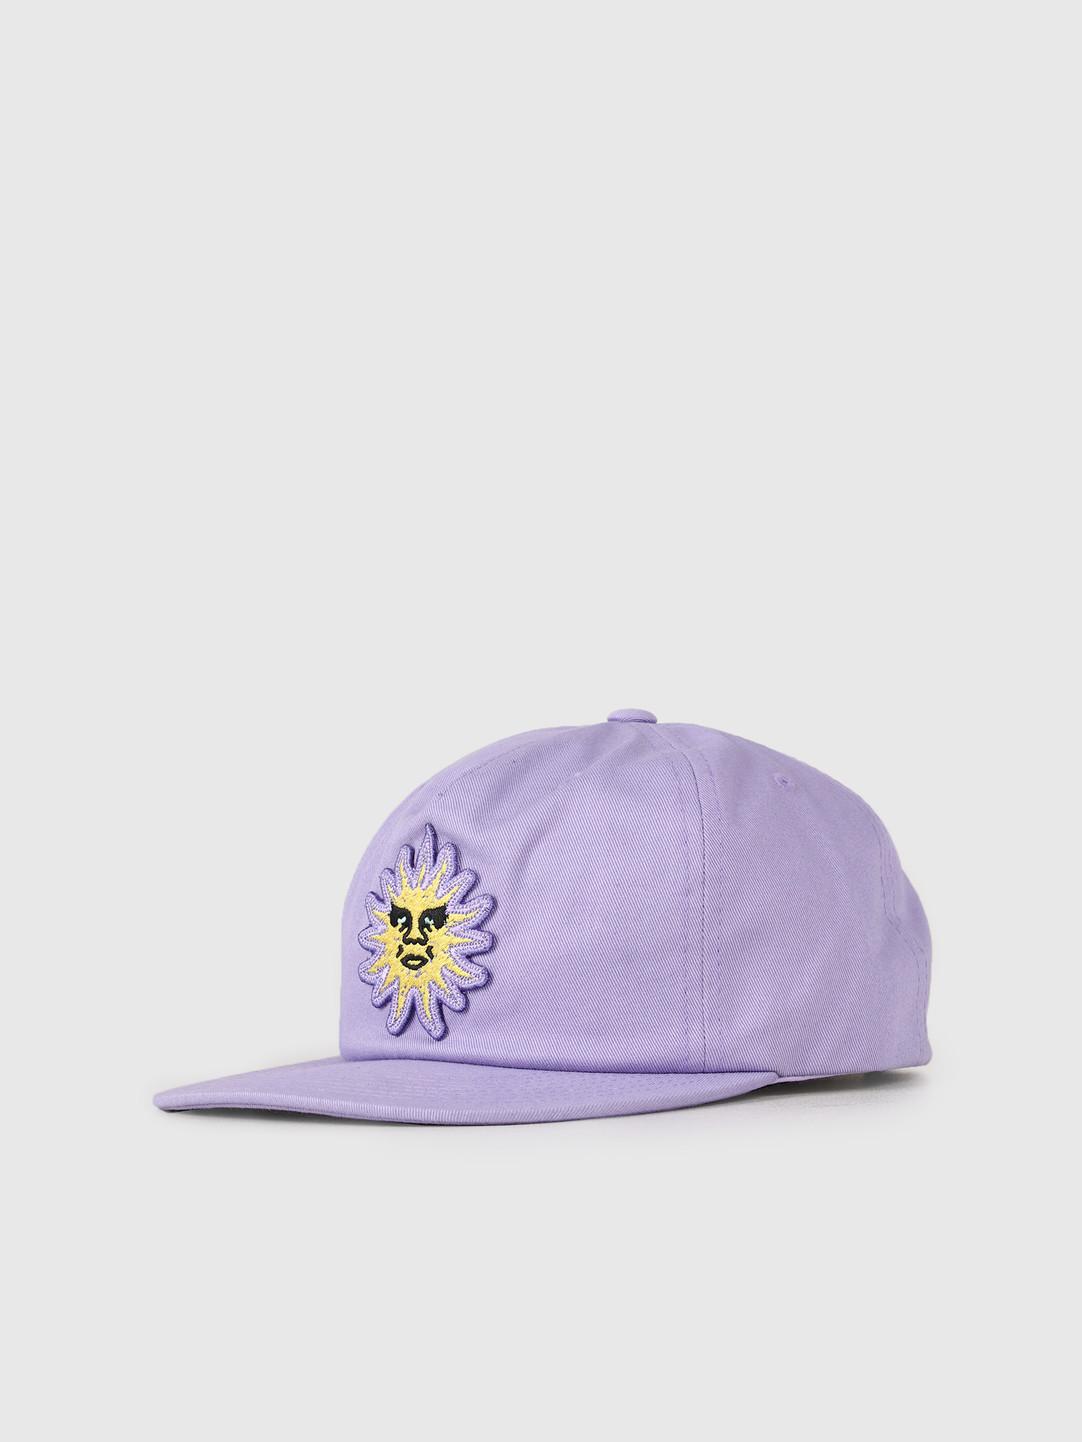 Obey Obey Rising Sun Snapback Lavender 100570096-LAV